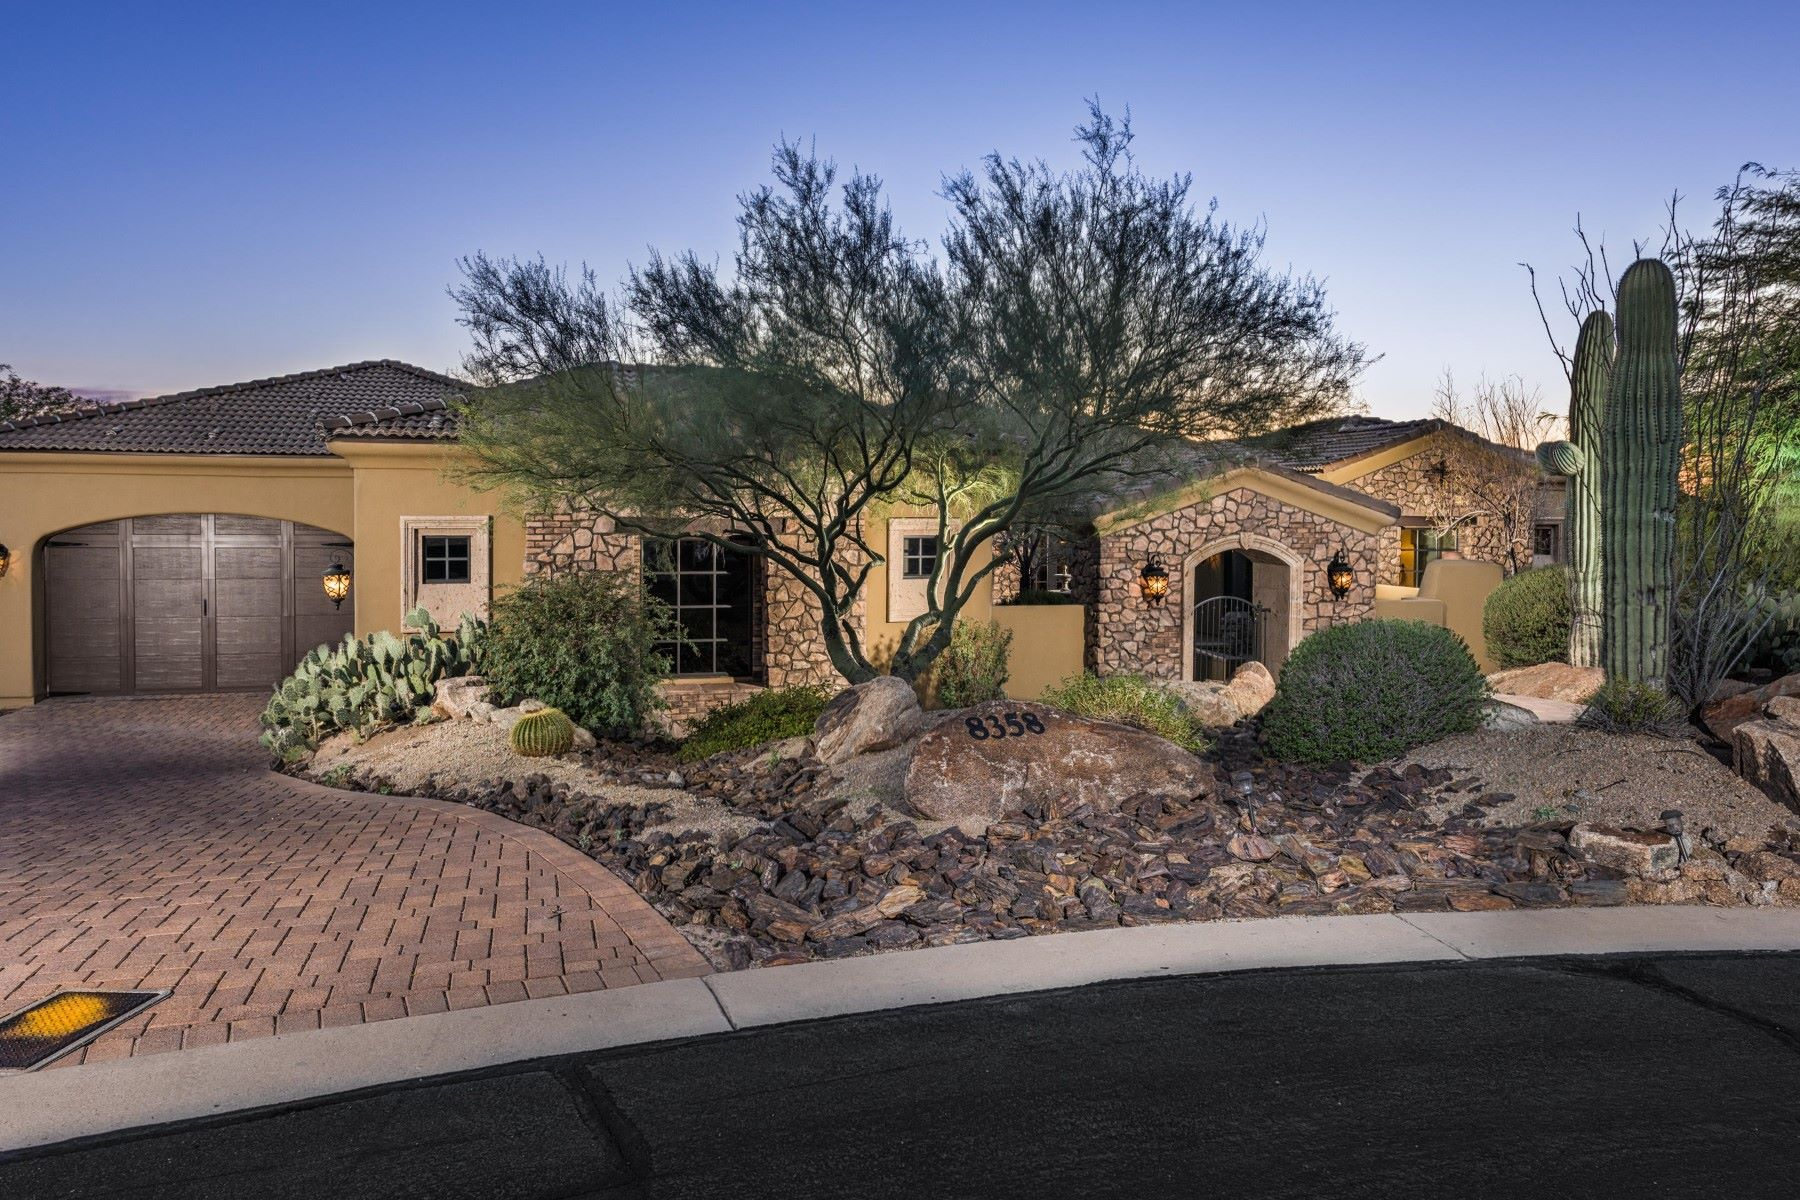 Moradia para Venda às Beautiful home in the gated community of Pinnacle Ridge 8358 E View Crest Cir Mesa, Arizona, 85207 Estados Unidos